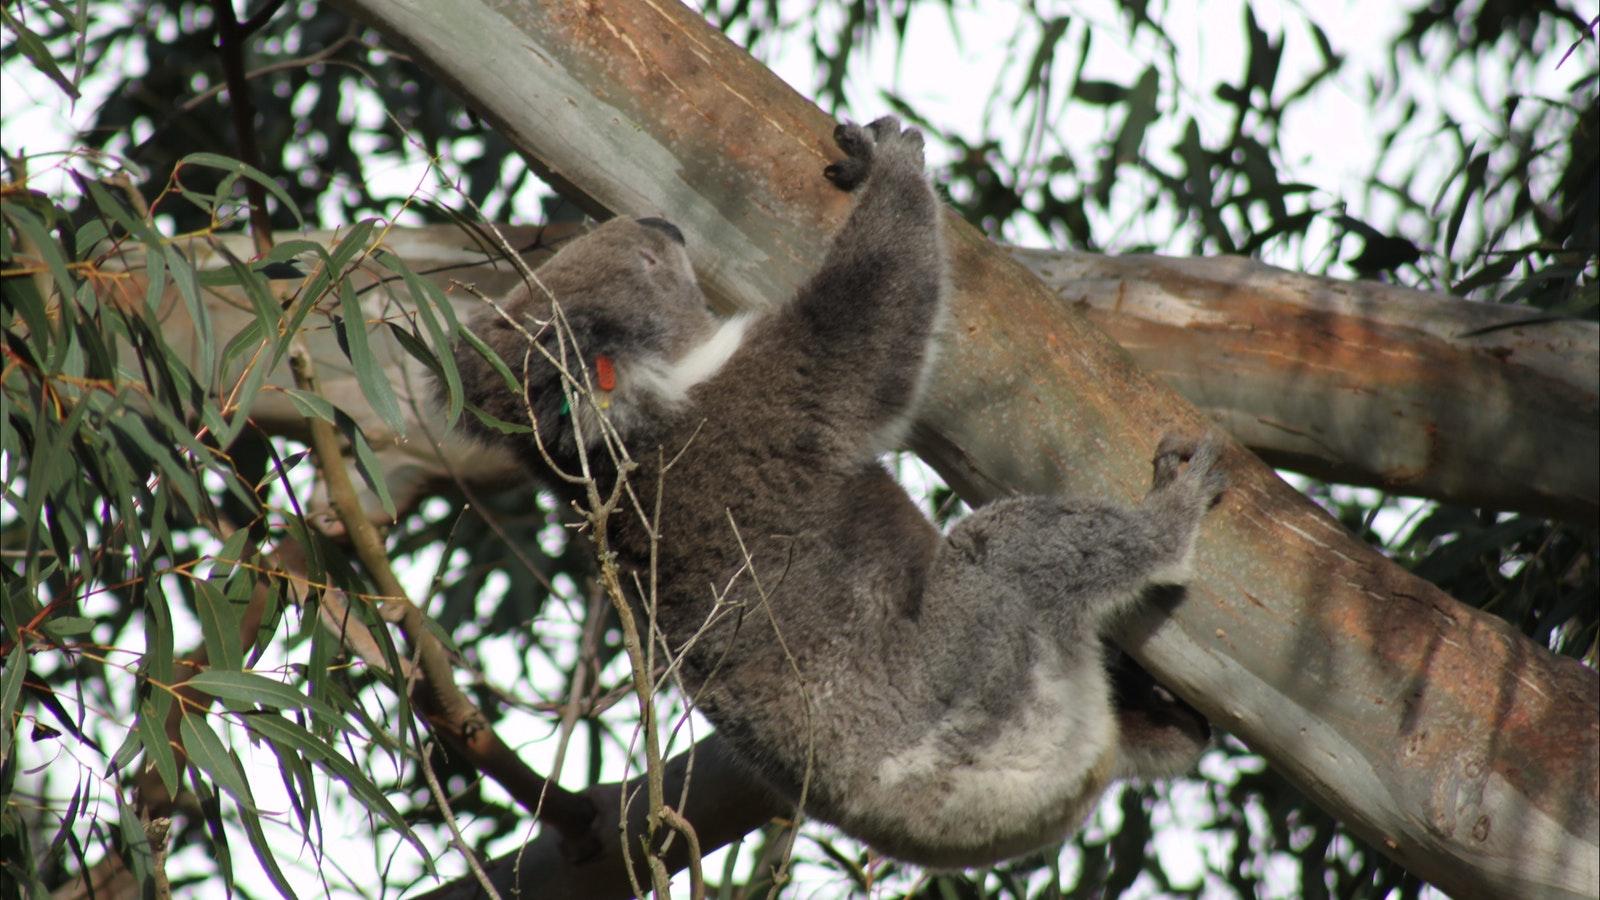 Koala are abundant along the Great Ocean Road